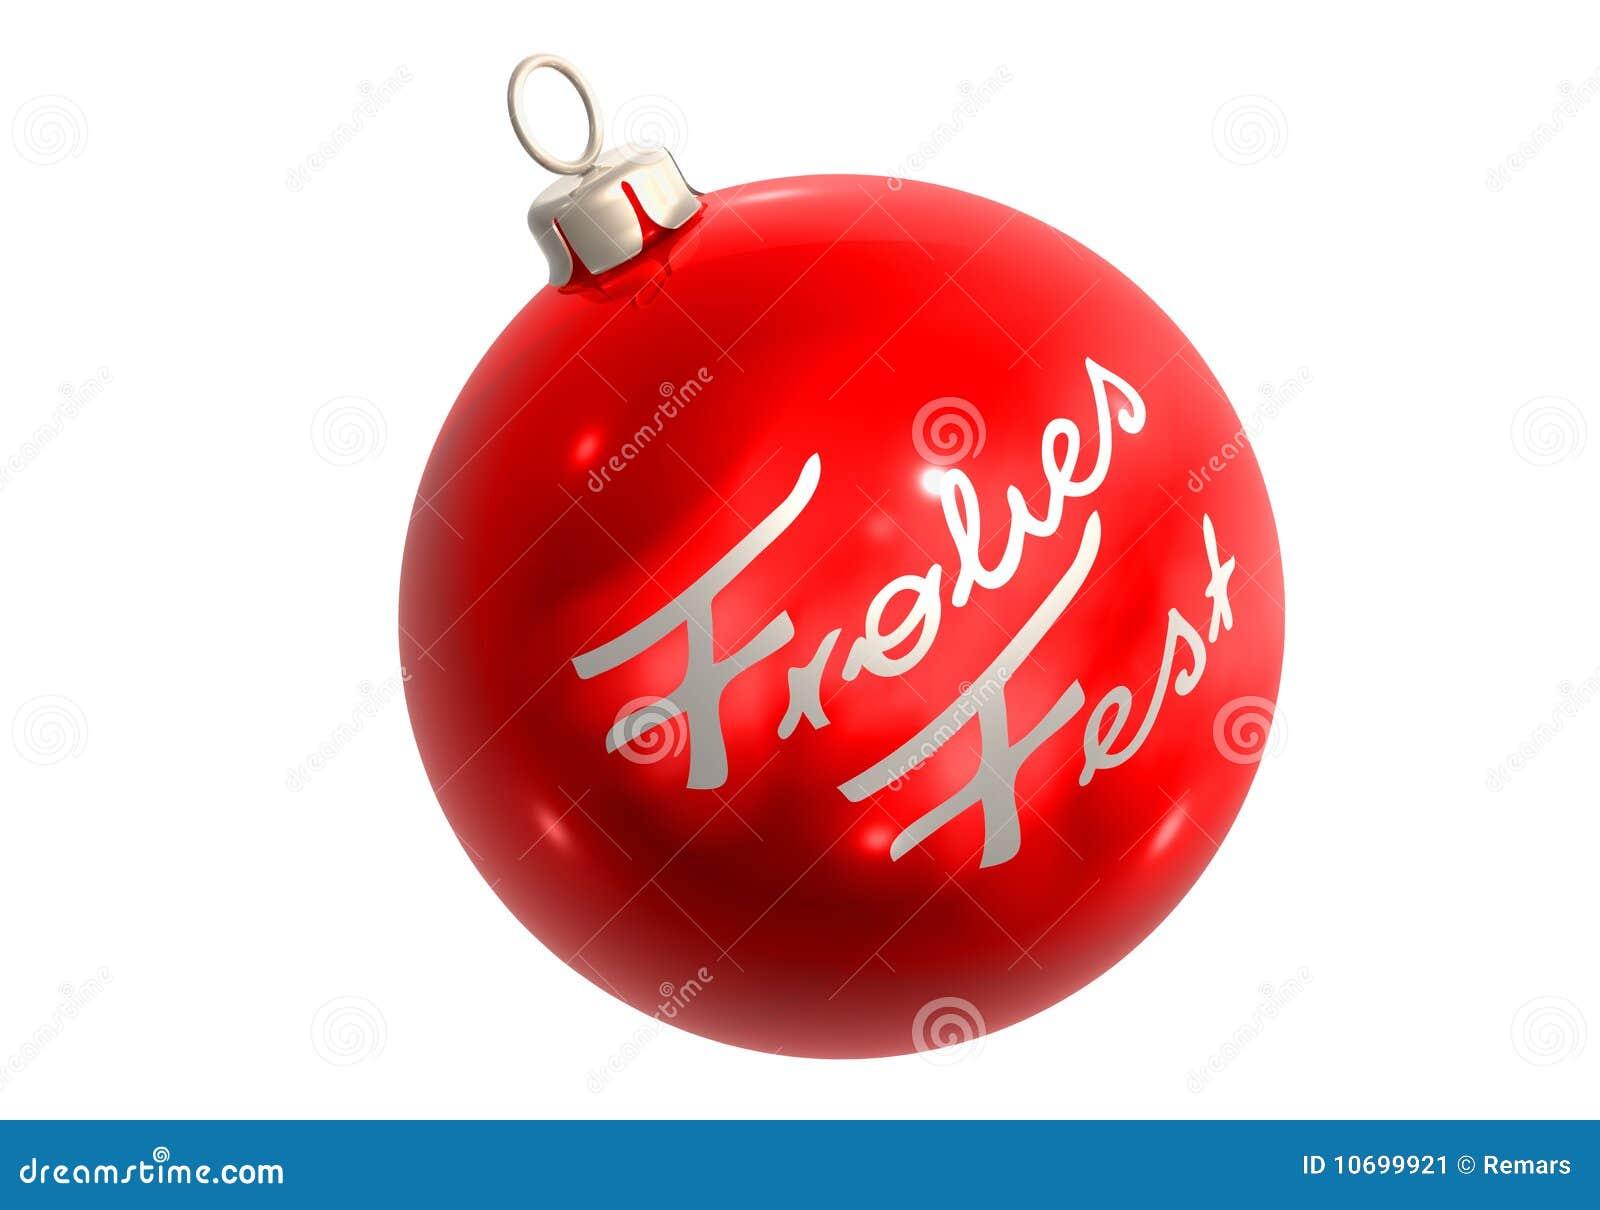 Rote christbaumkugel frohes fest stock illustration - Bilder weihnachtskugeln ...